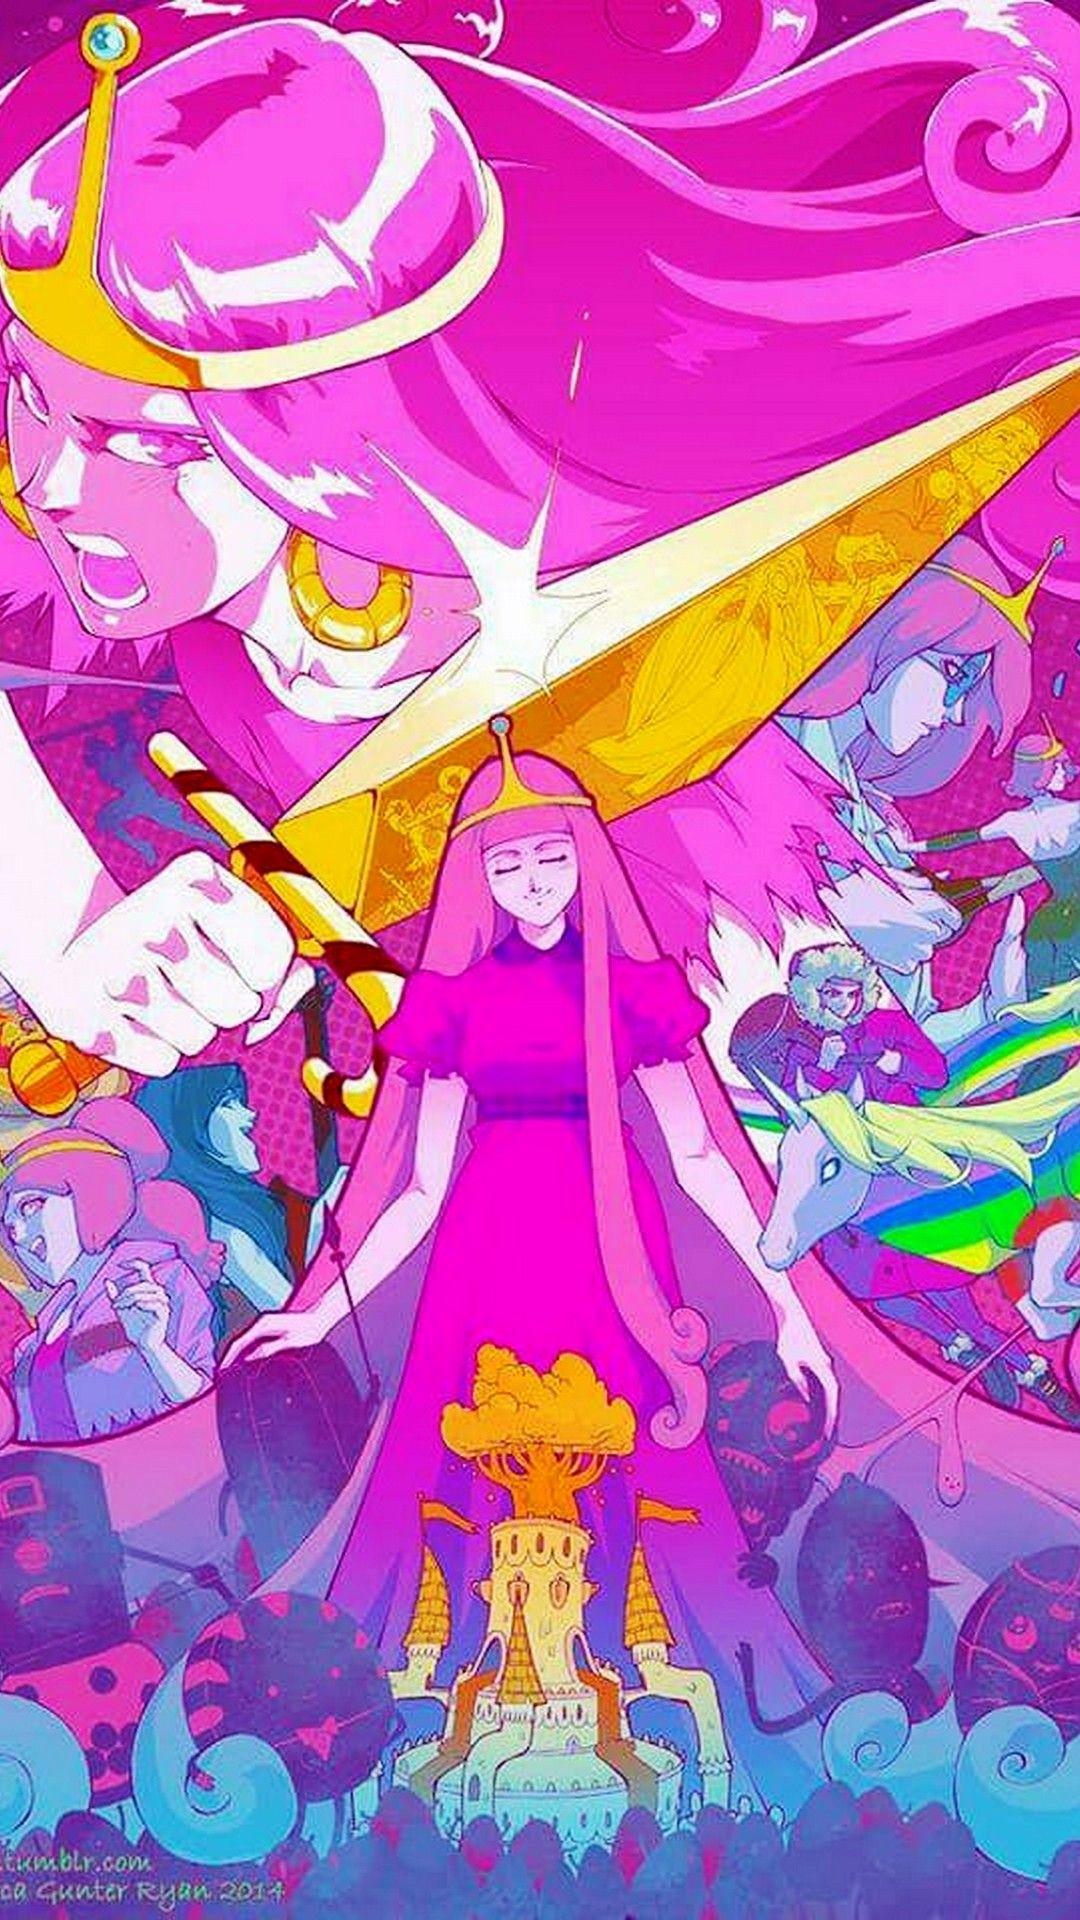 Adventure Time Wallpaper iPhone | Adventure time cartoon ...